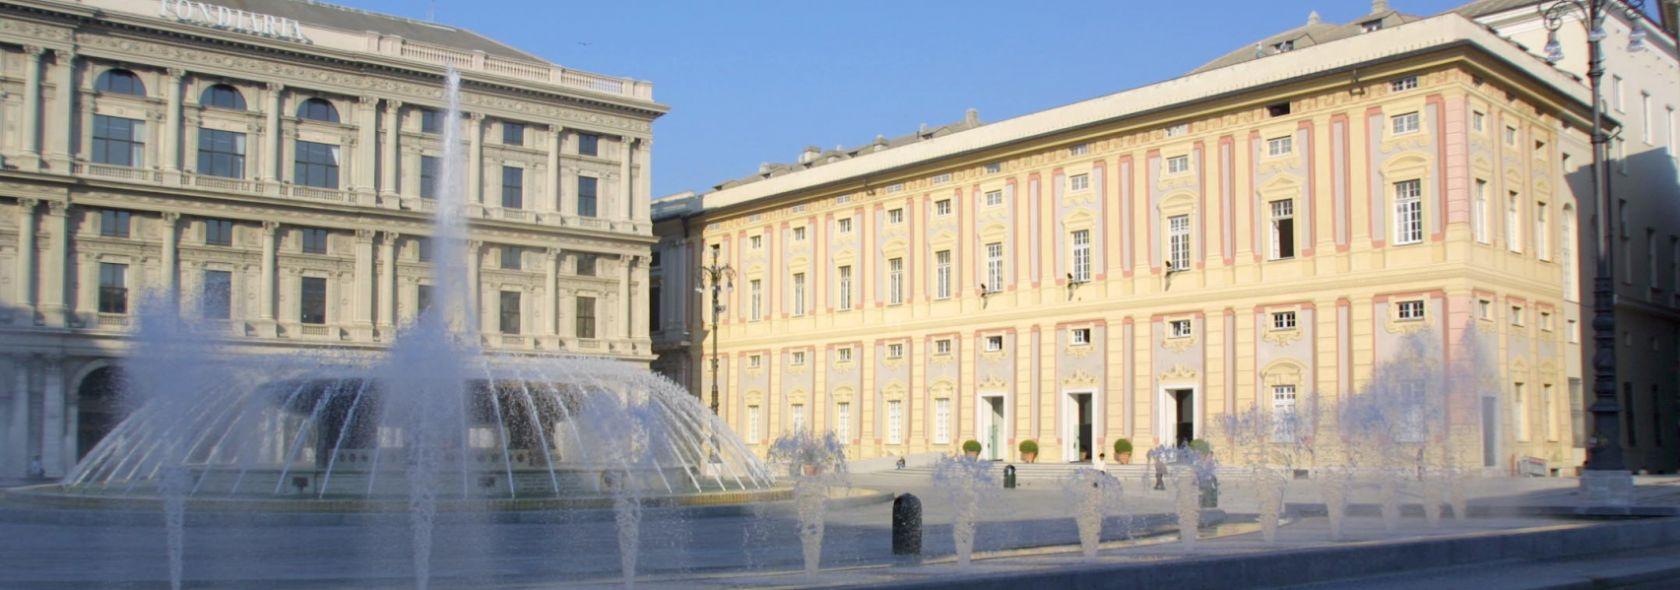 Piazza de Ferrari - Foto Ufficio Comunicazione Città Metropolitana di Genova